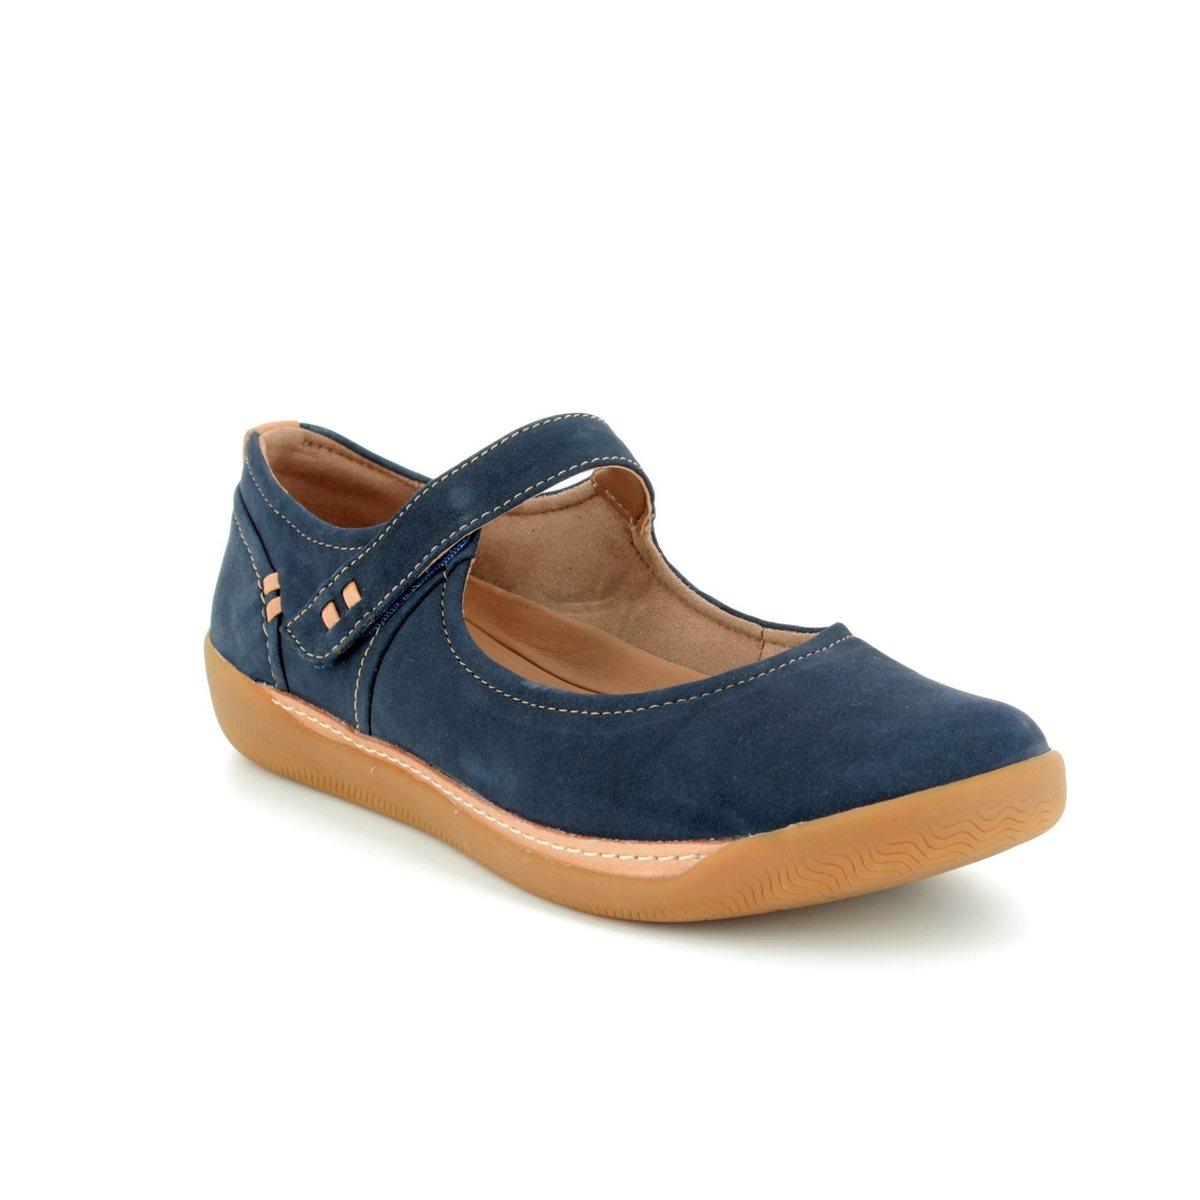 e4578fe50eb8 Clarks Mary Jane Shoes - Navy - 3400 34D UN HAVEN STRAP